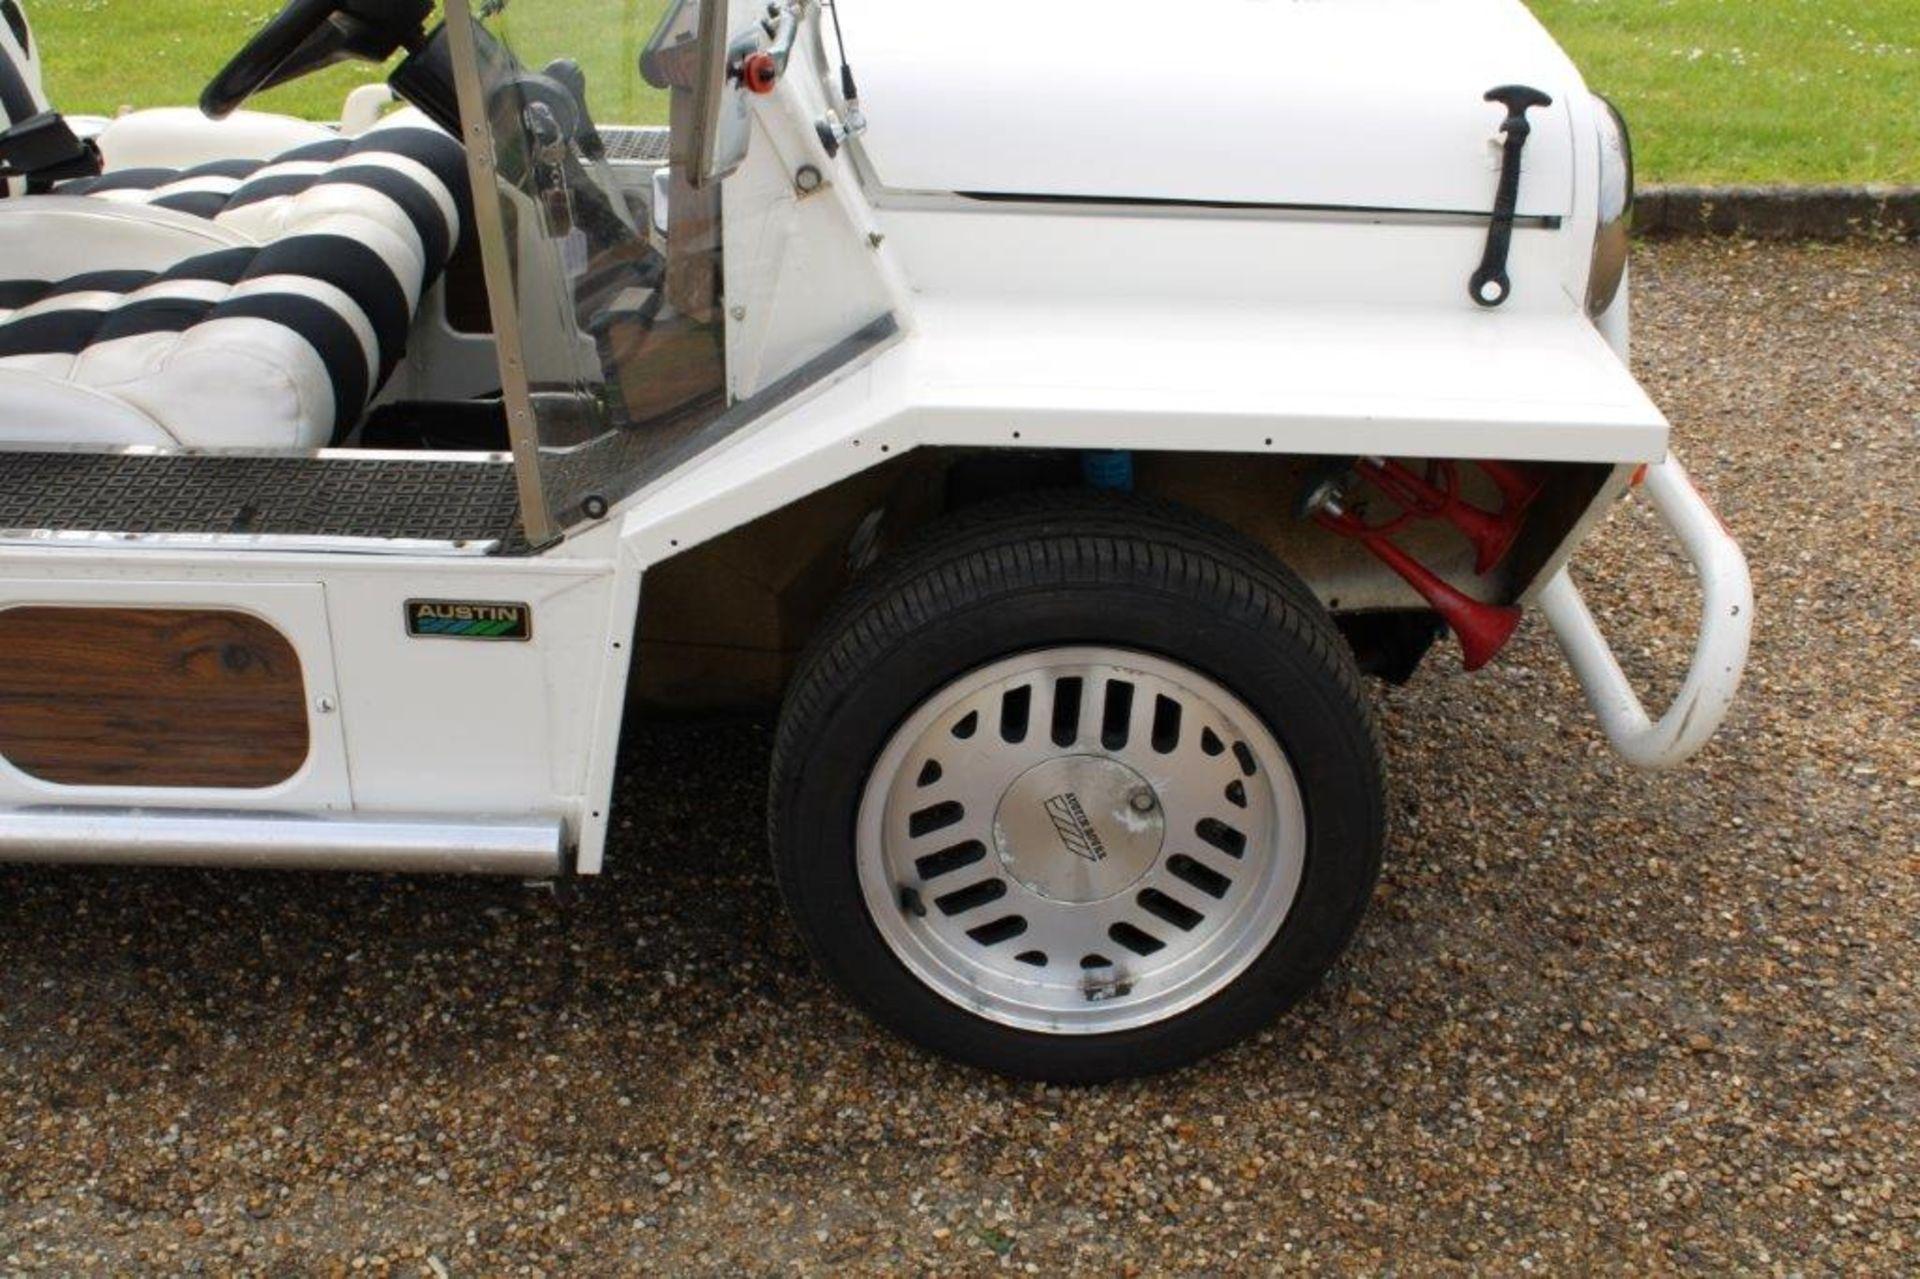 1988 Austin Rover Mini Moke - Image 7 of 22